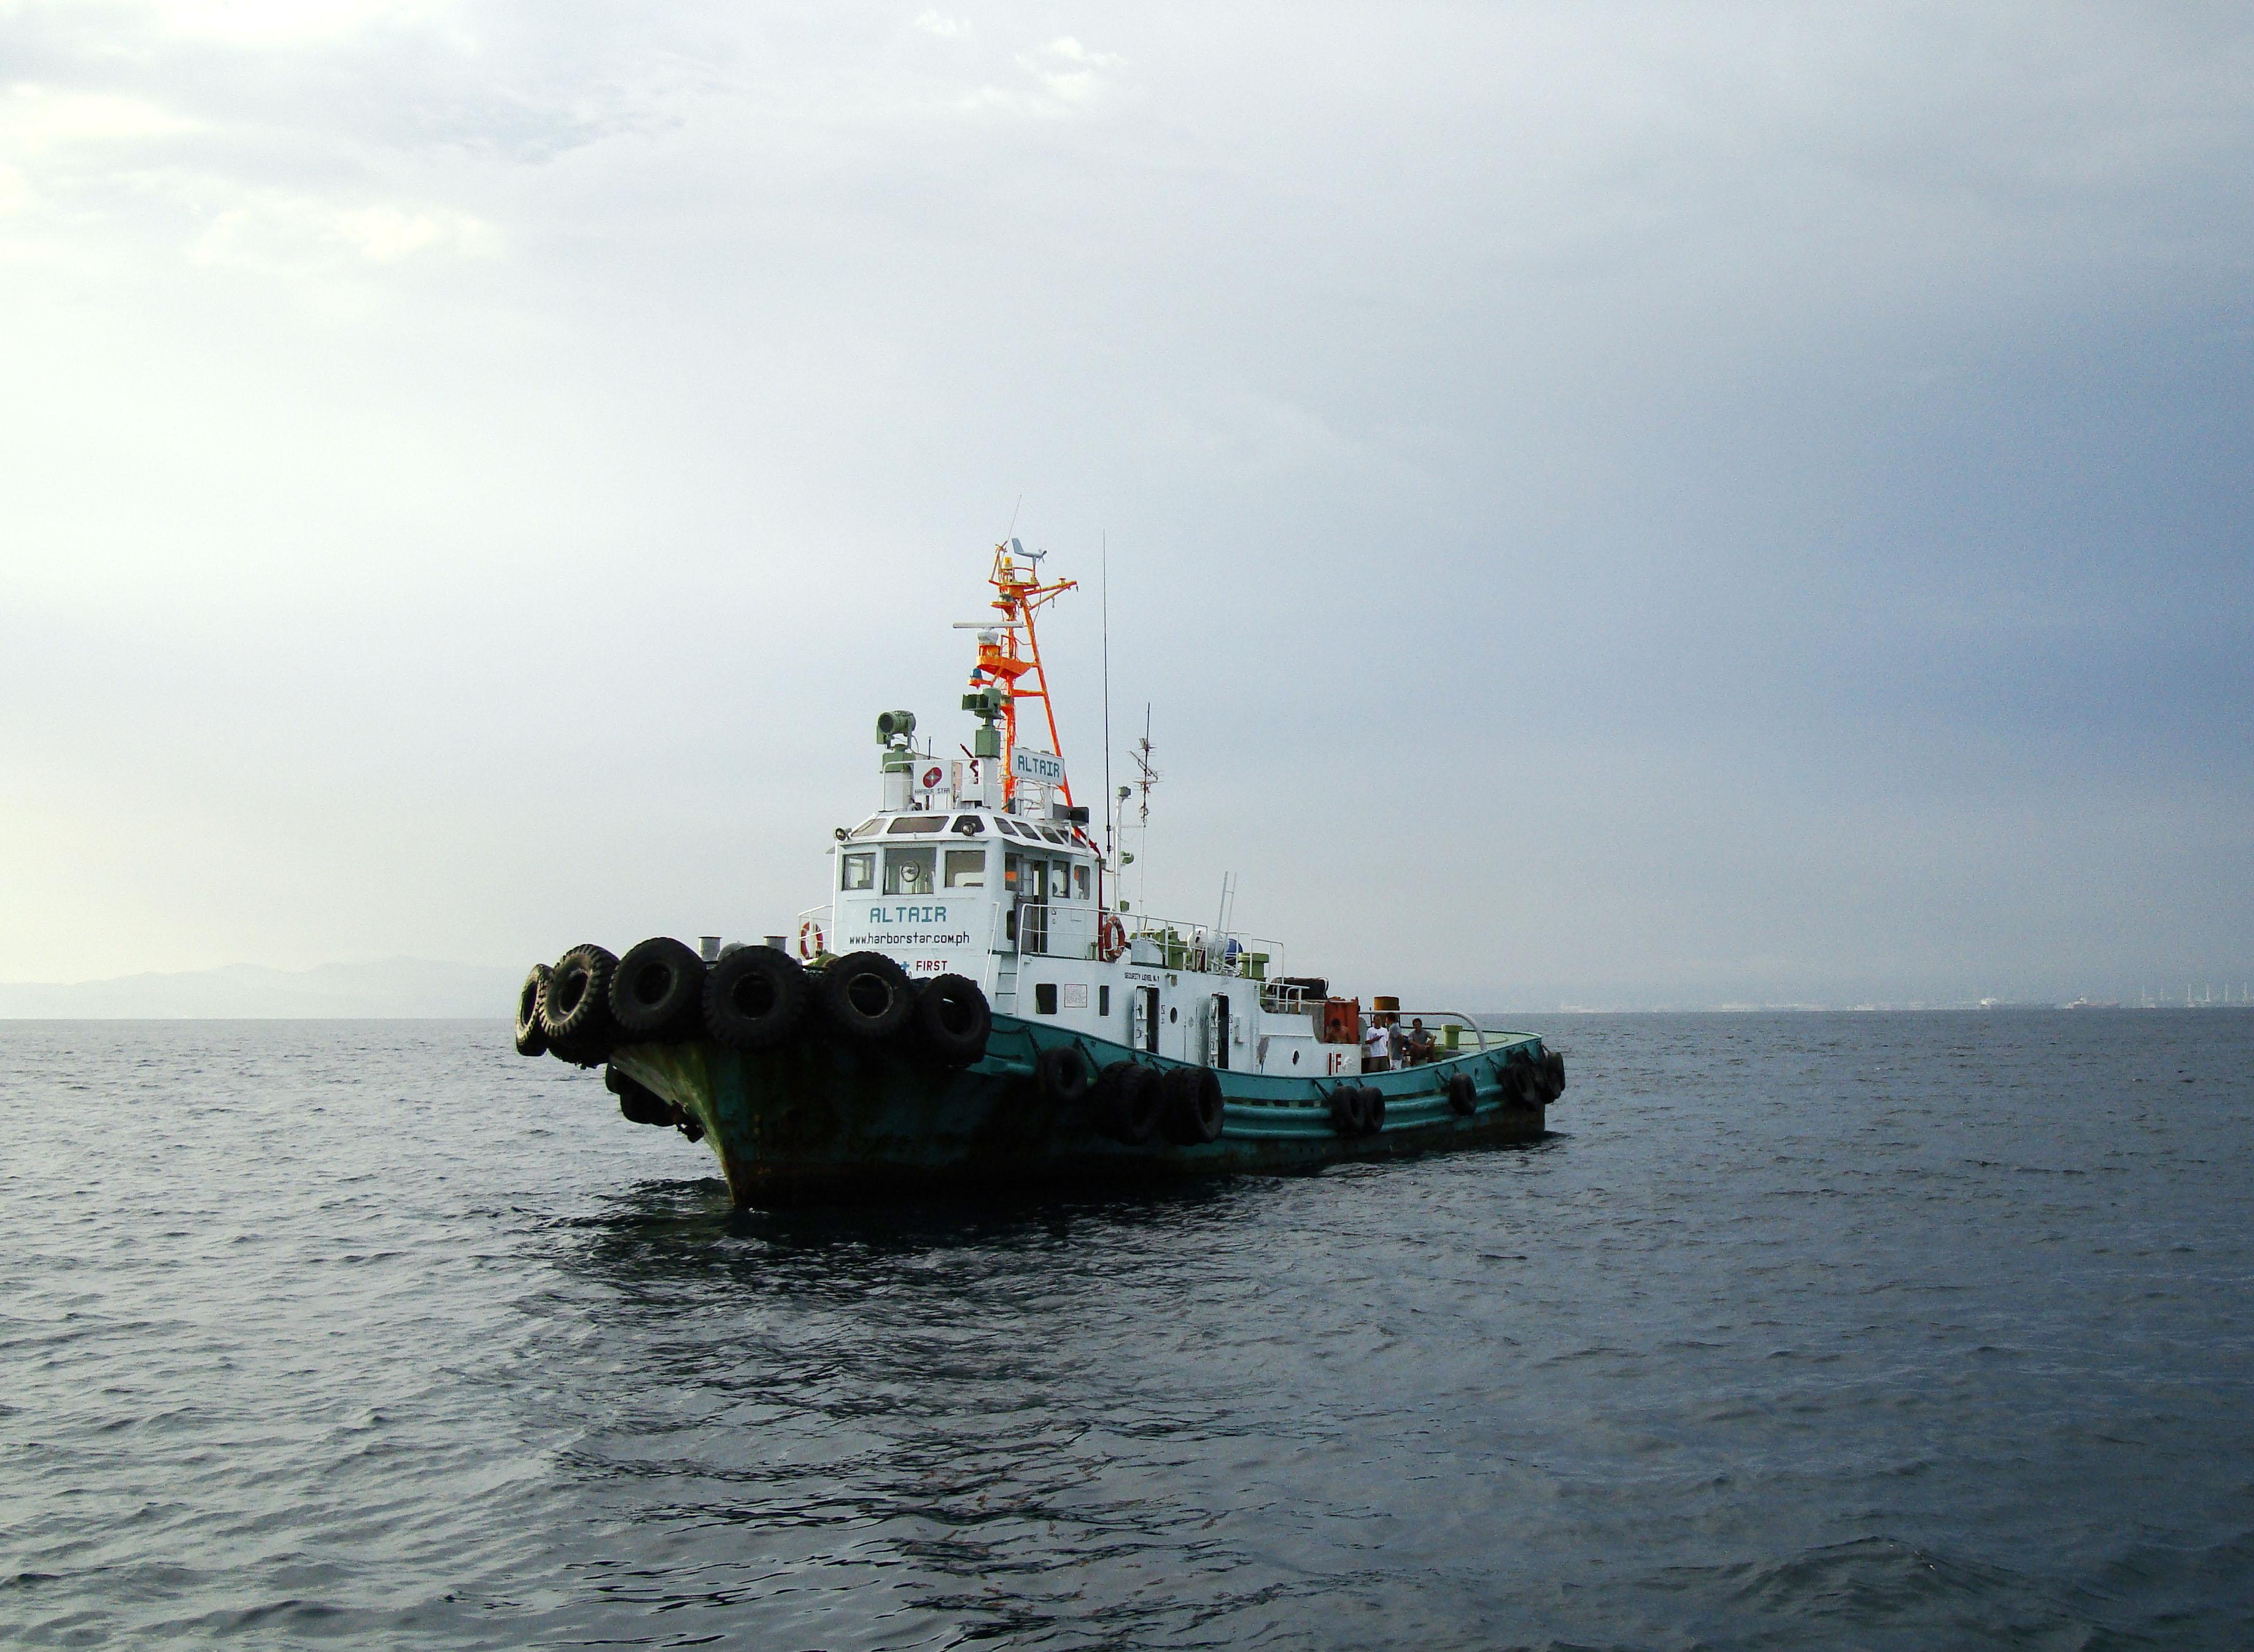 MV Altair Tug boat wwwharborstarcomph Batangus Philippines 02